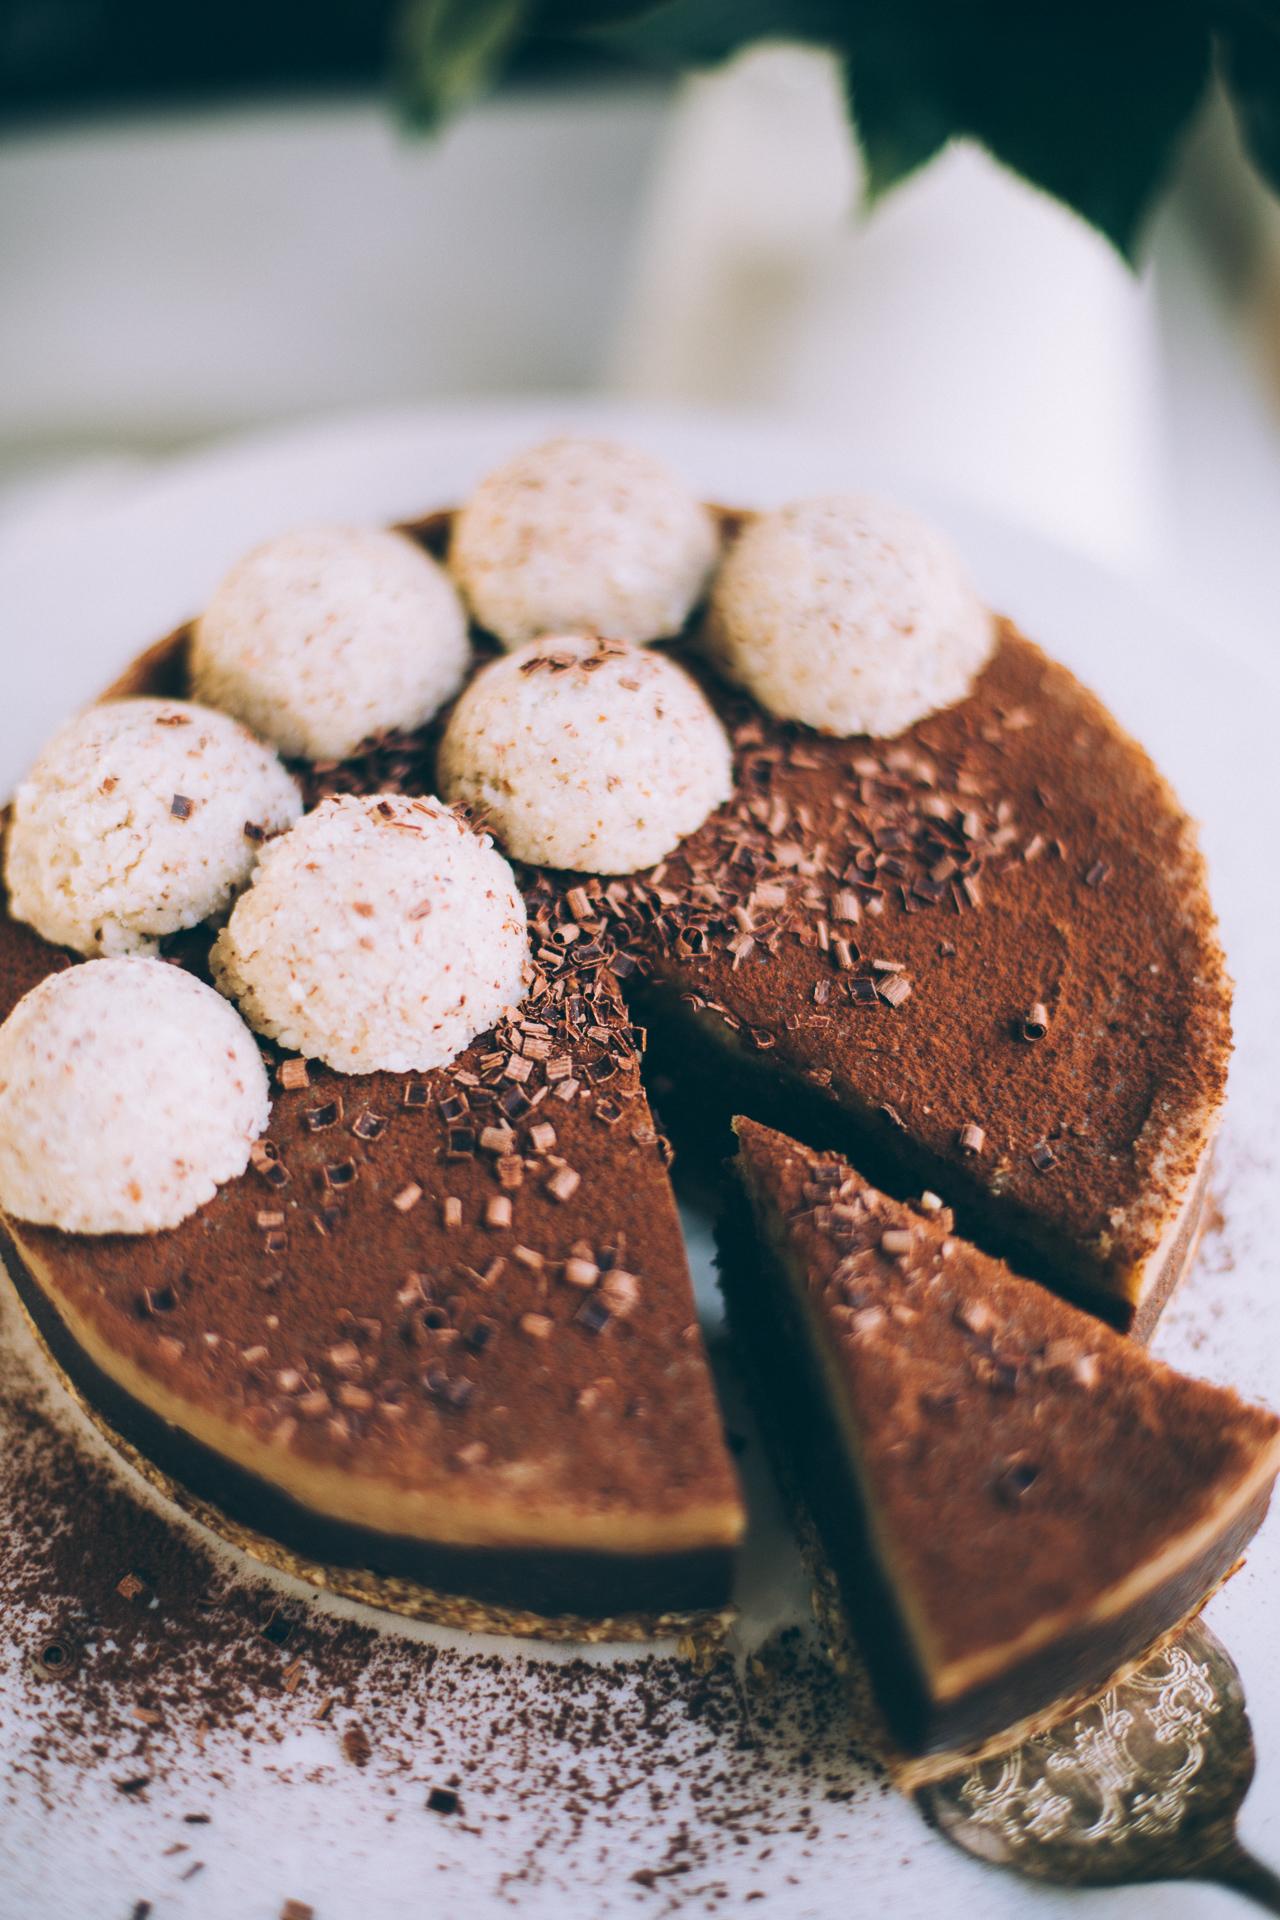 raw-vegan-chocolate-cashew-caramel-cake-7177.jpg